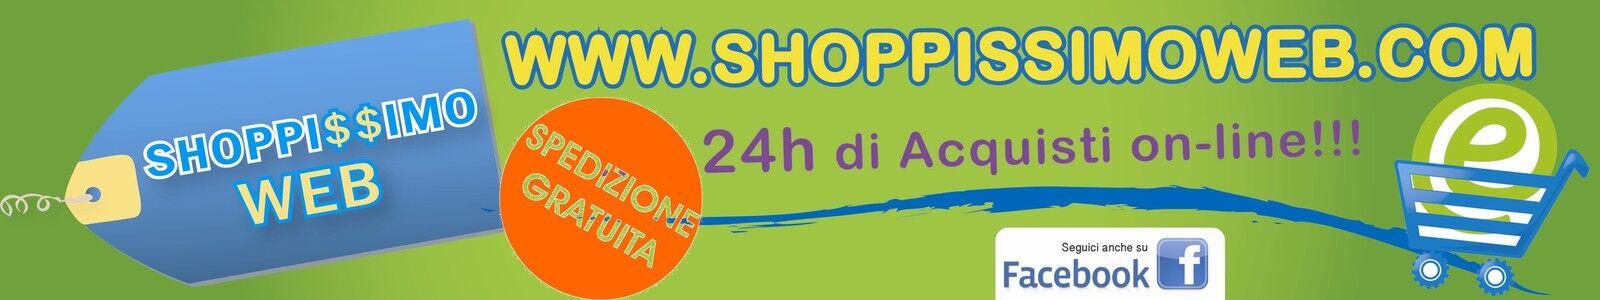 SHOPPI$$IMO WEB